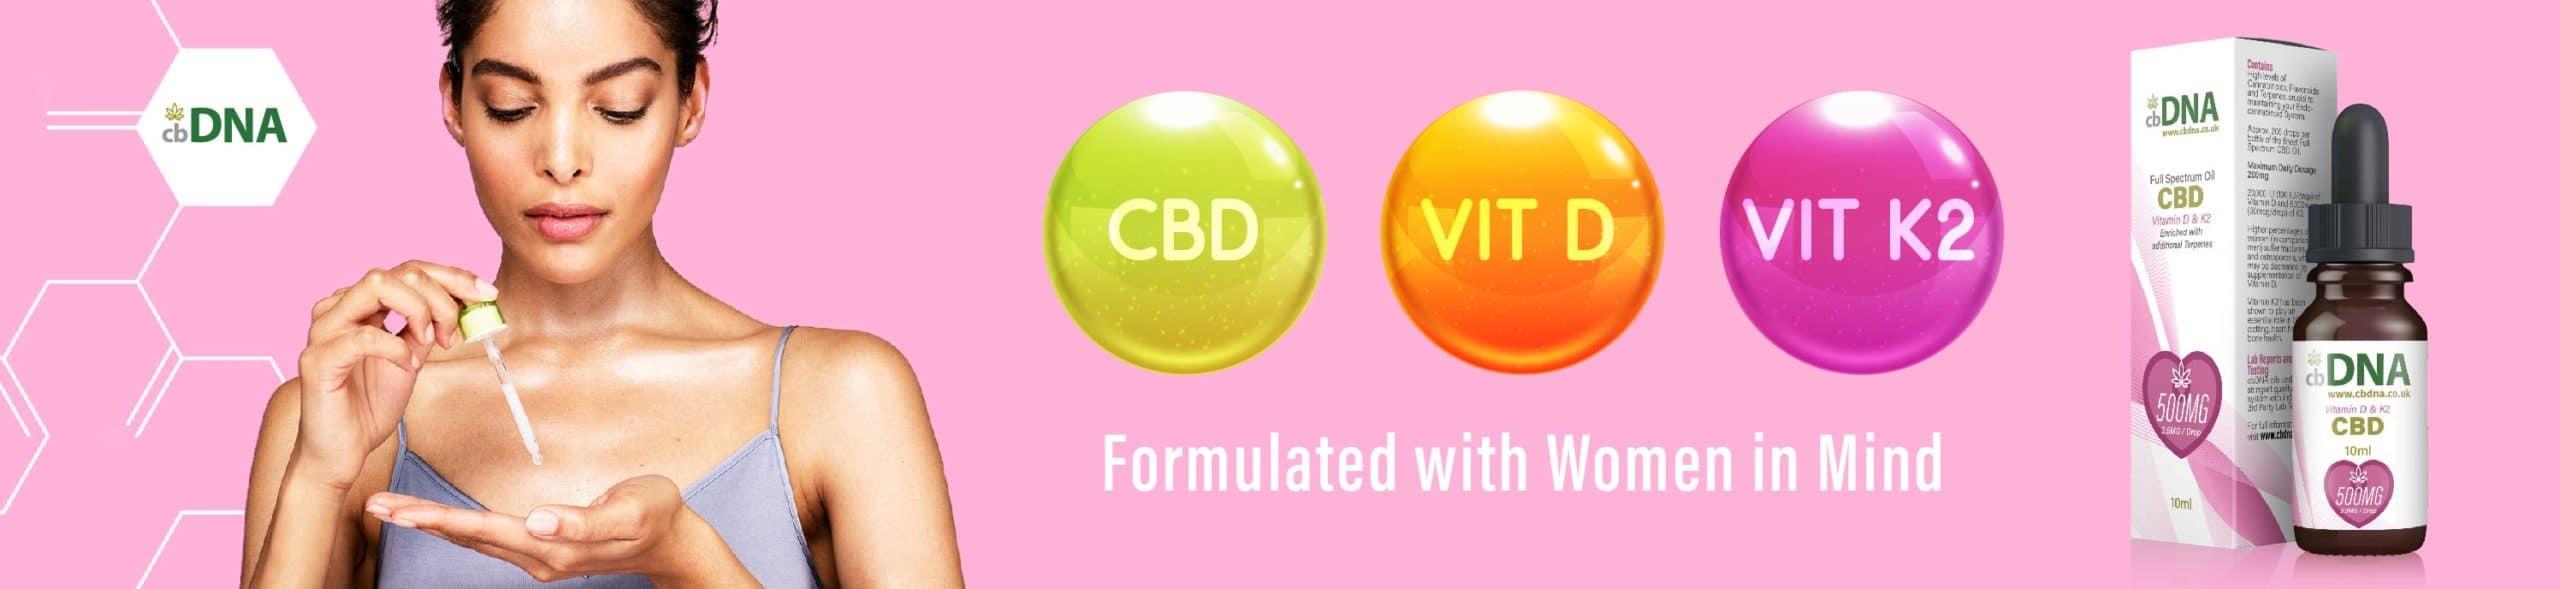 CBD Women Vitamins